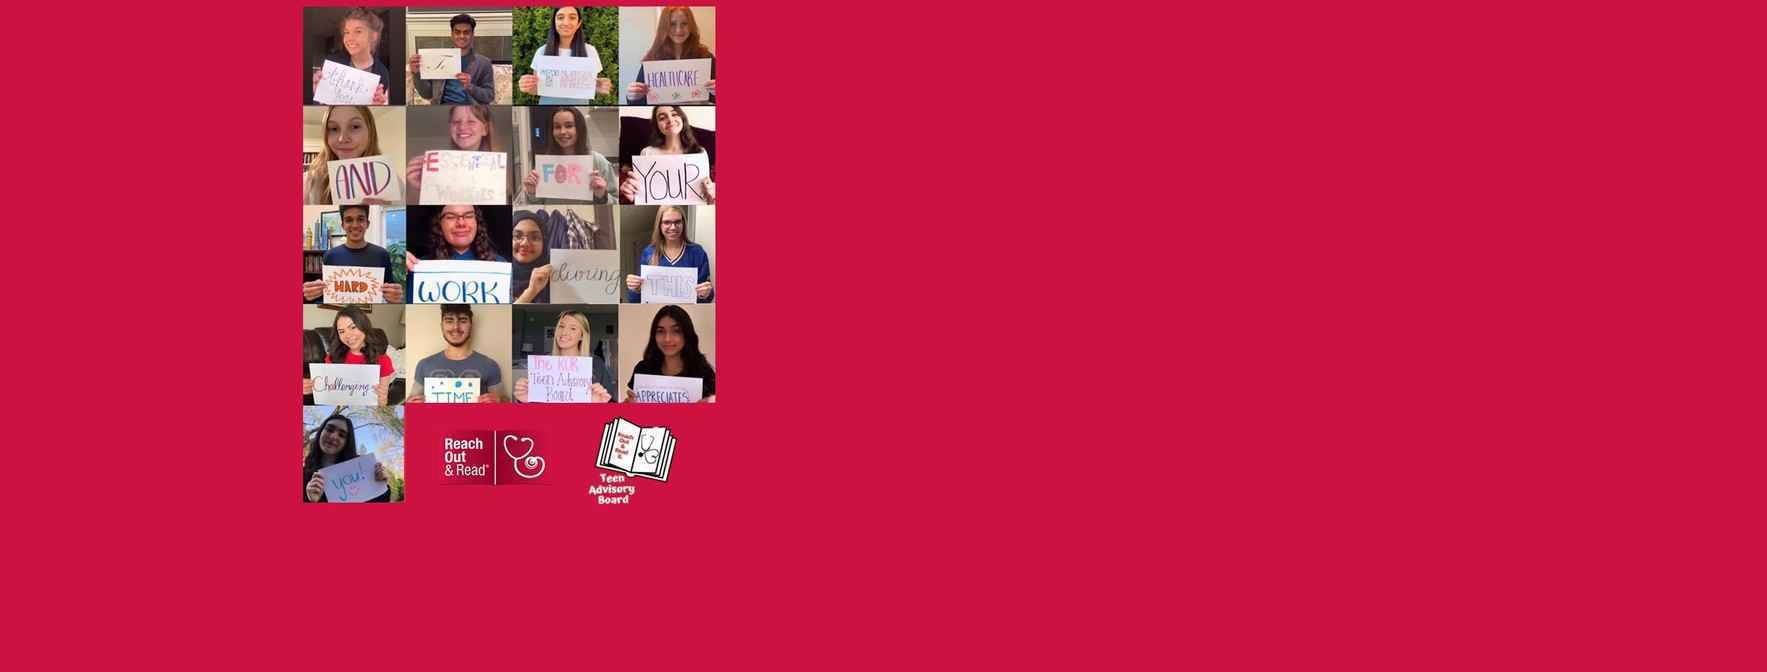 Teen Advisory Board Read-a-Thon Fundraiser image